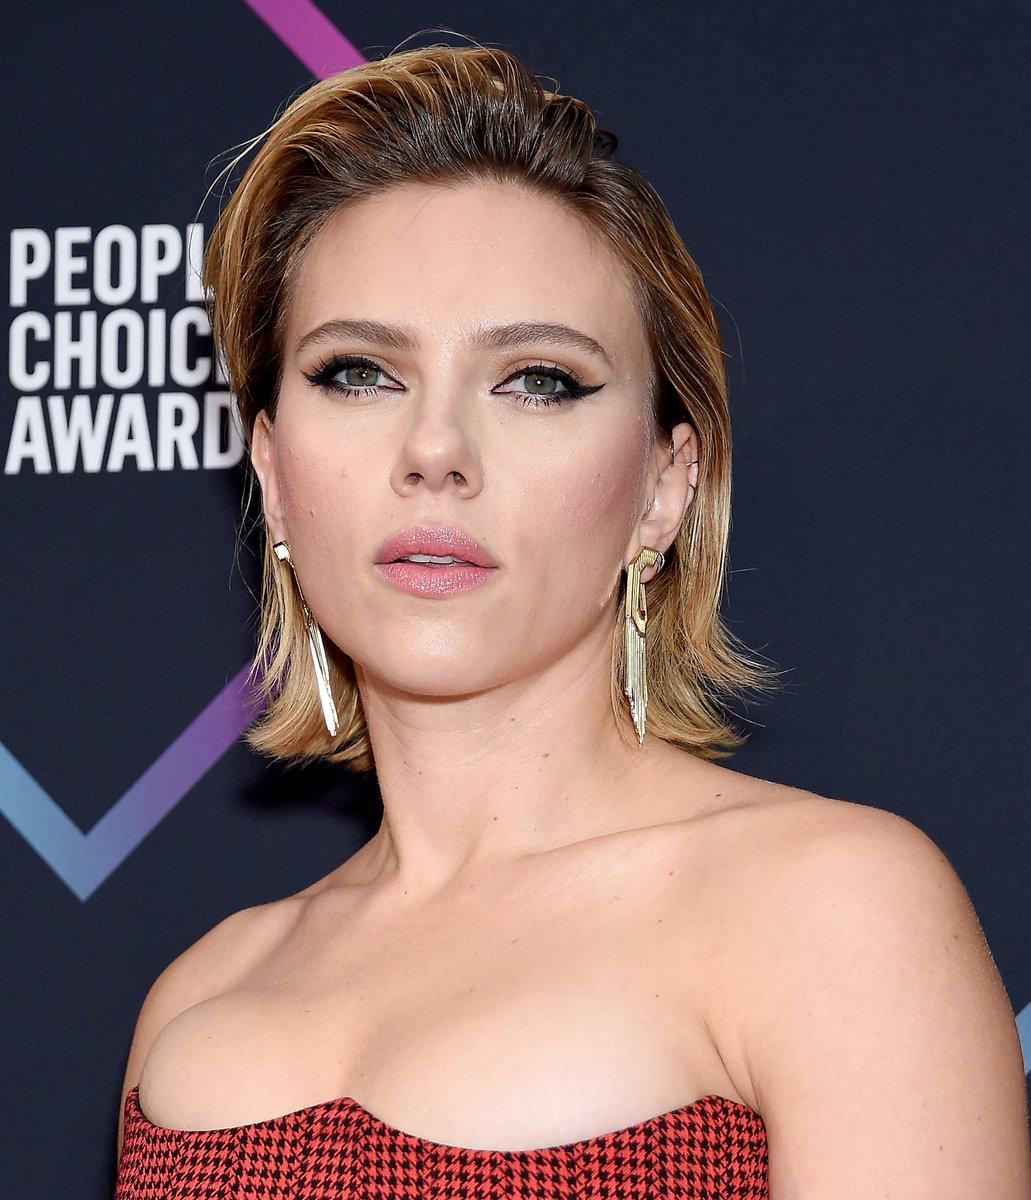 Twitter Scarlett Johansson nudes (78 photos), Pussy, Hot, Boobs, cameltoe 2015